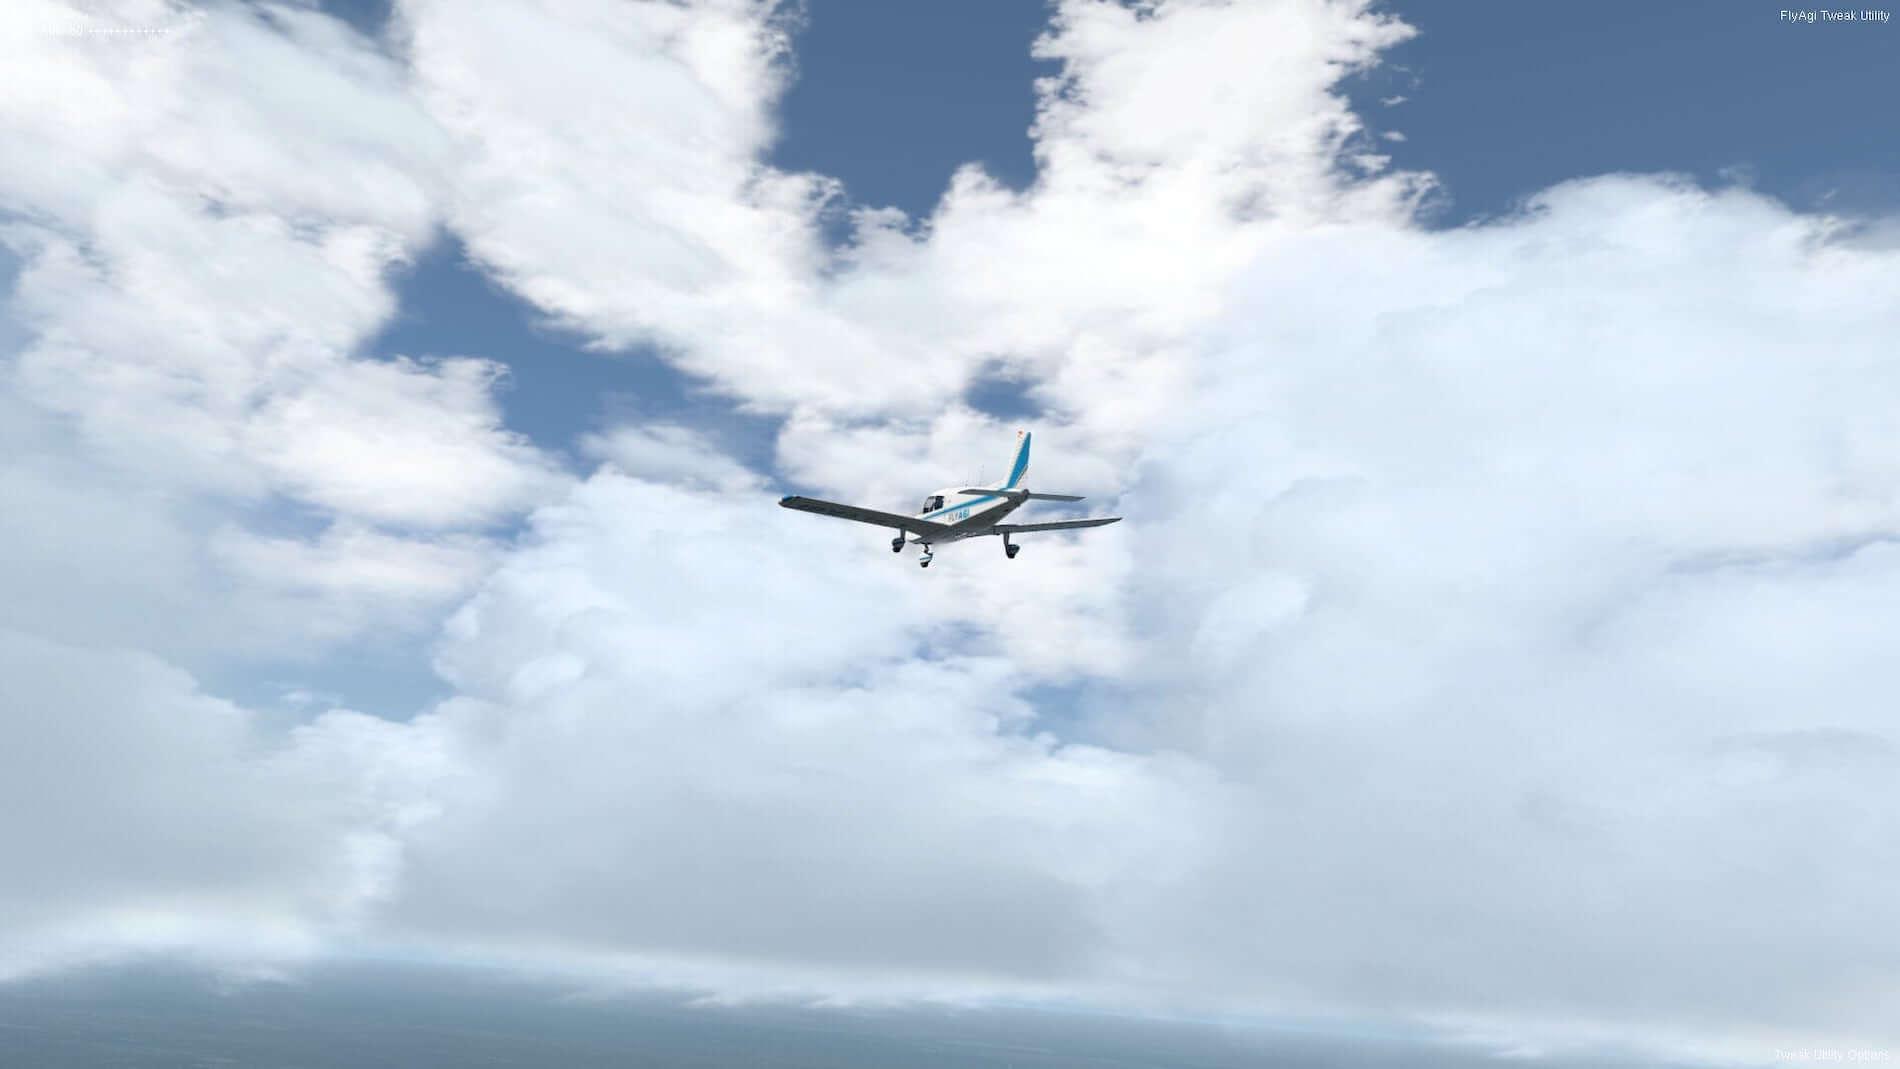 FlyAGI-FTU-Weather-System-ASXP-3